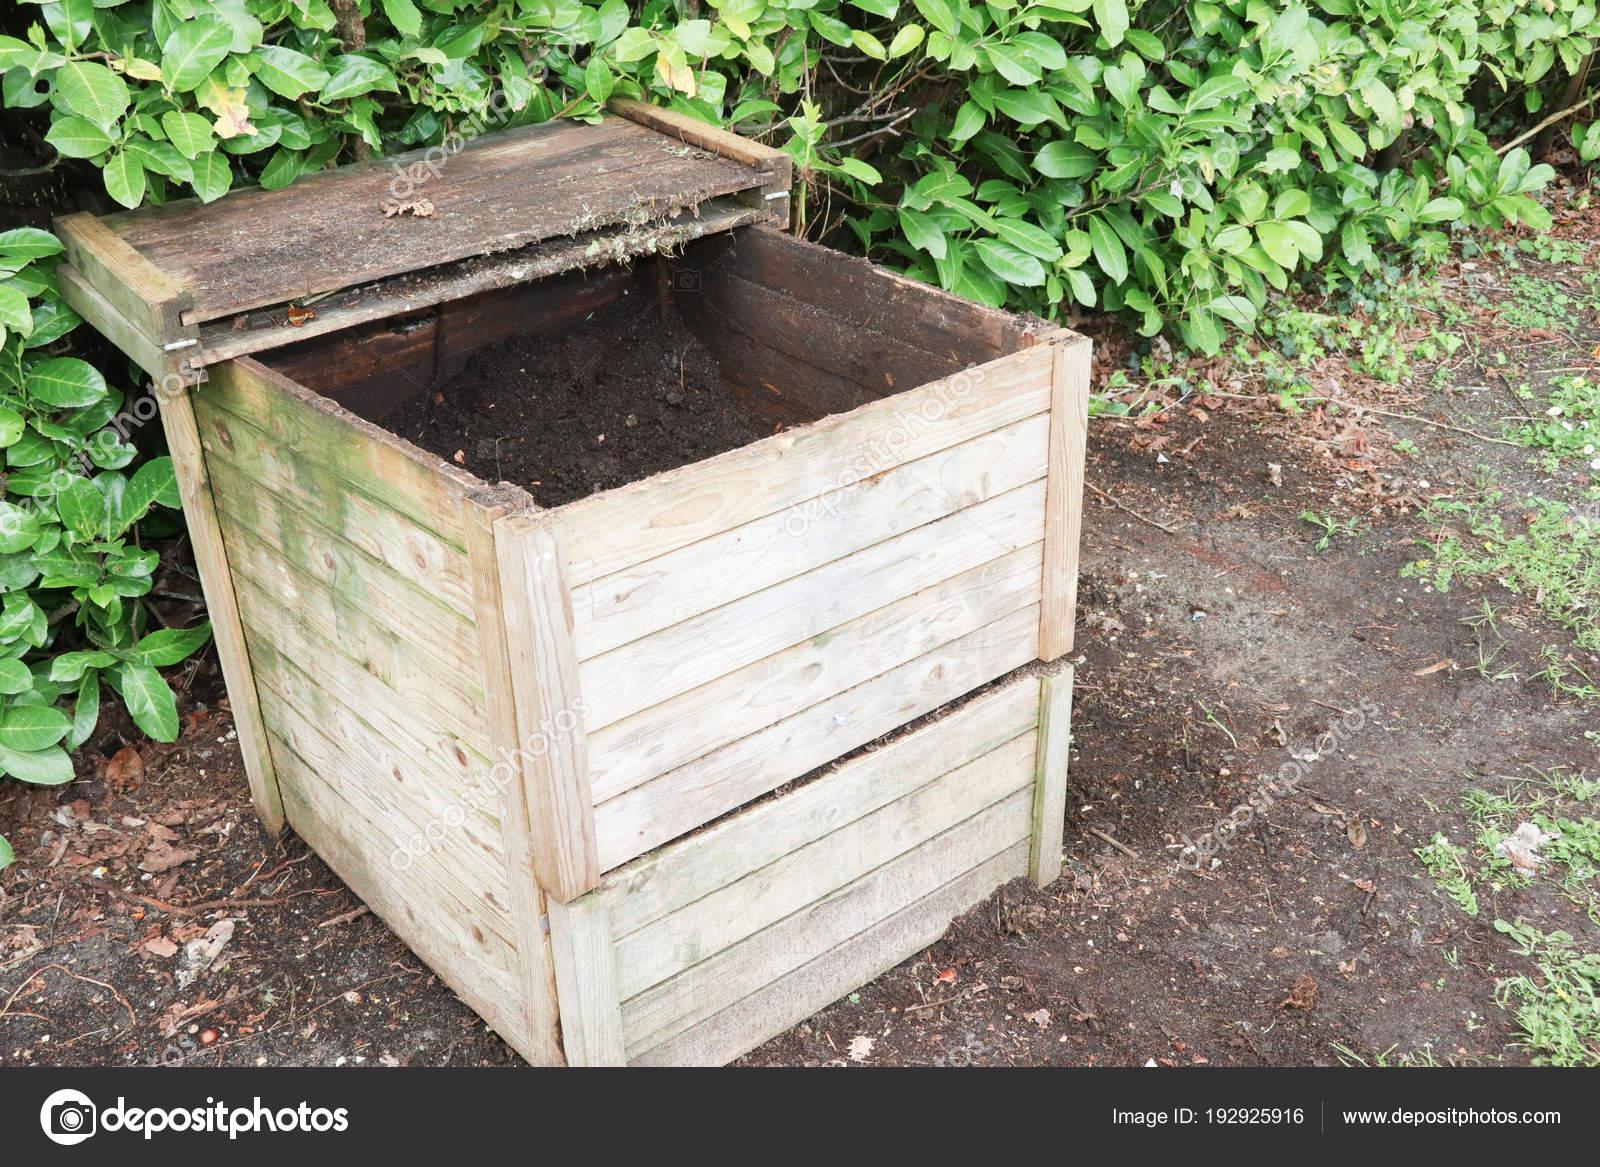 compost bin for kitchen cabinets online wholesale 用于回收厨房和花园有机废弃物的小型木材户外堆肥箱 图库照片 c sylv1rob1